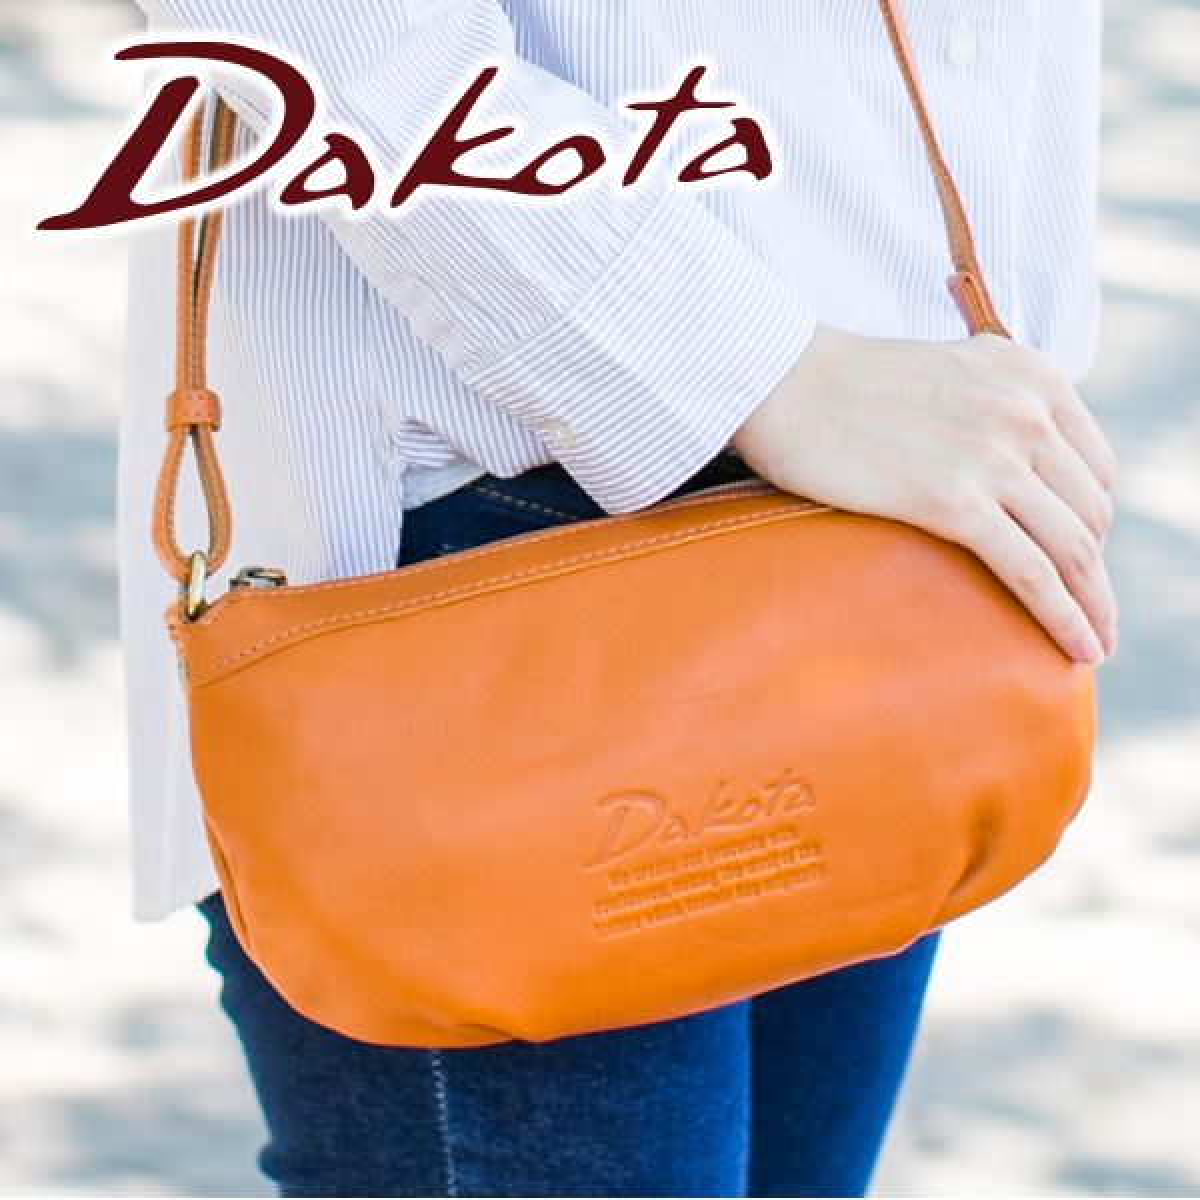 a4dc44406162 ... ダコタ Dakota [正規品保証]☆選べるプレゼント贈呈! レディース バッグ 小さい ミニ